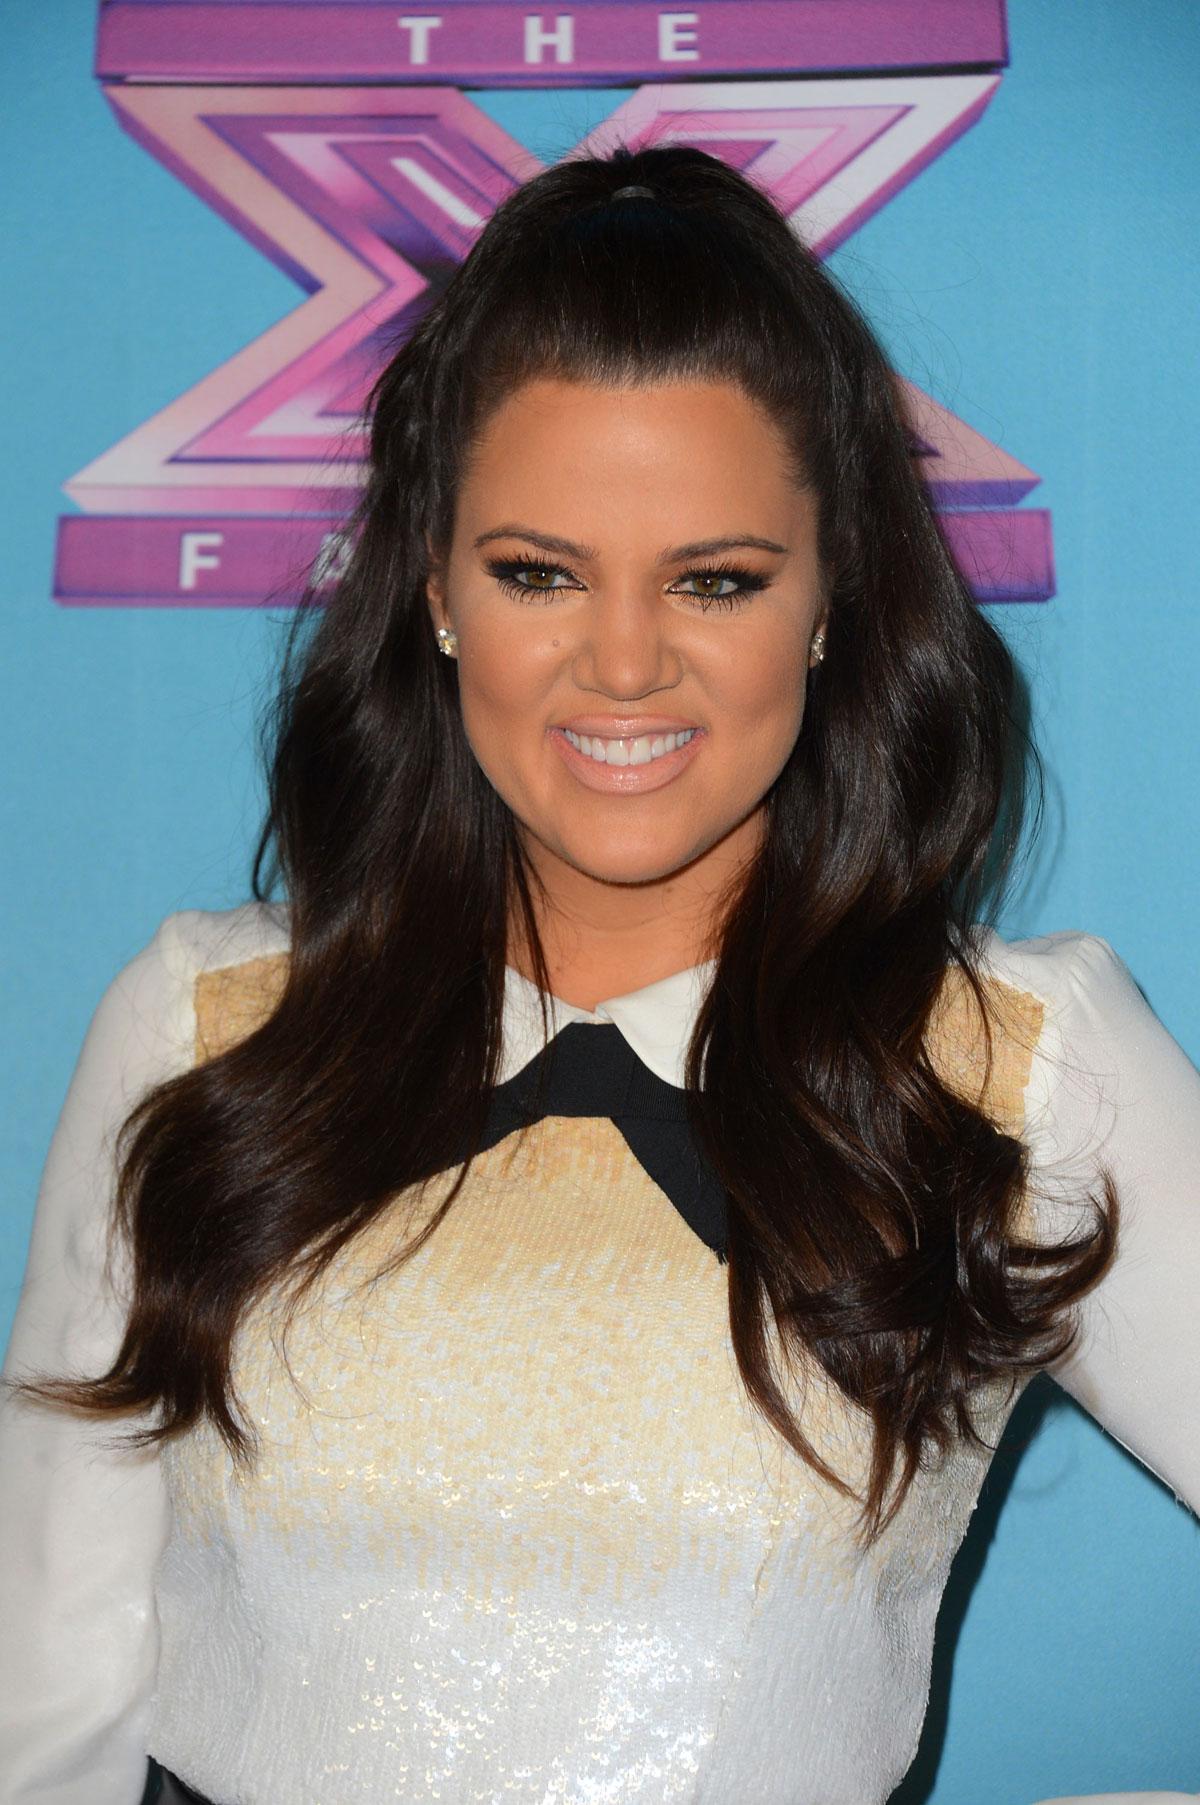 Khloe Kardashian At The X Factor Season Finale Night 1 In